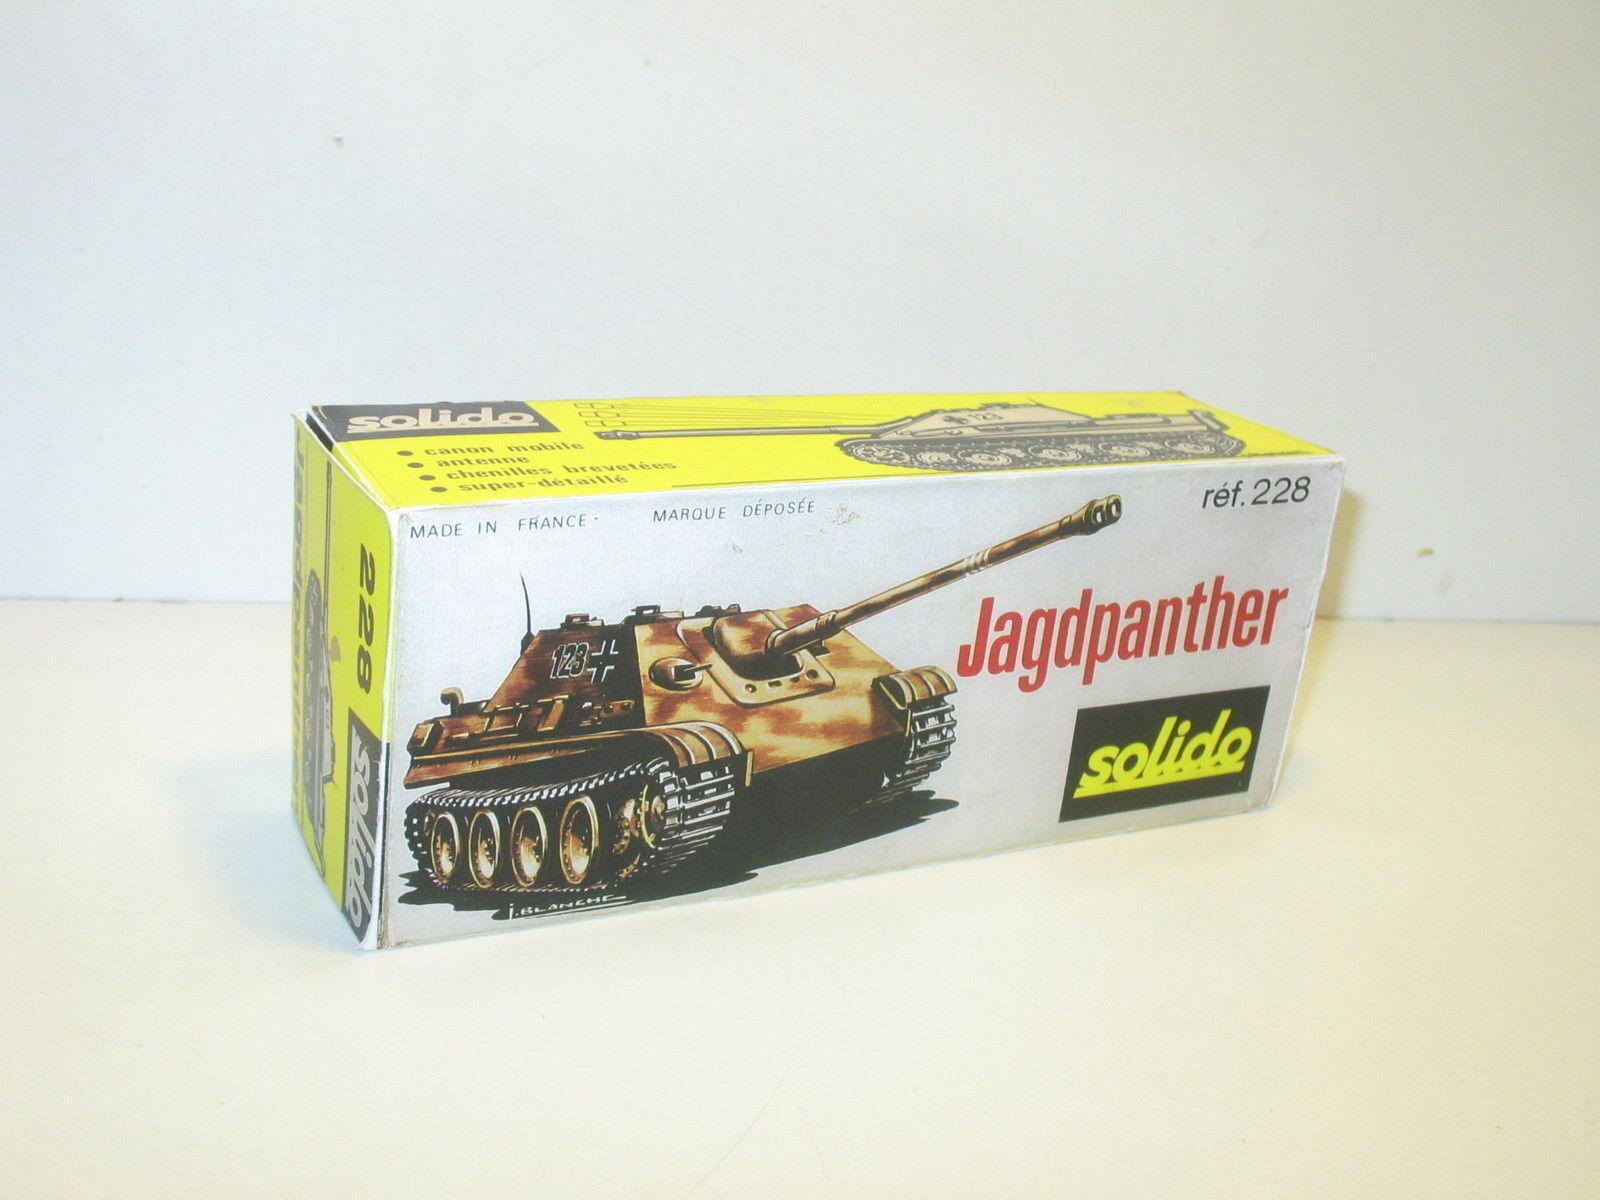 N80, CAJA militar tanque JAGDPANTHER solido